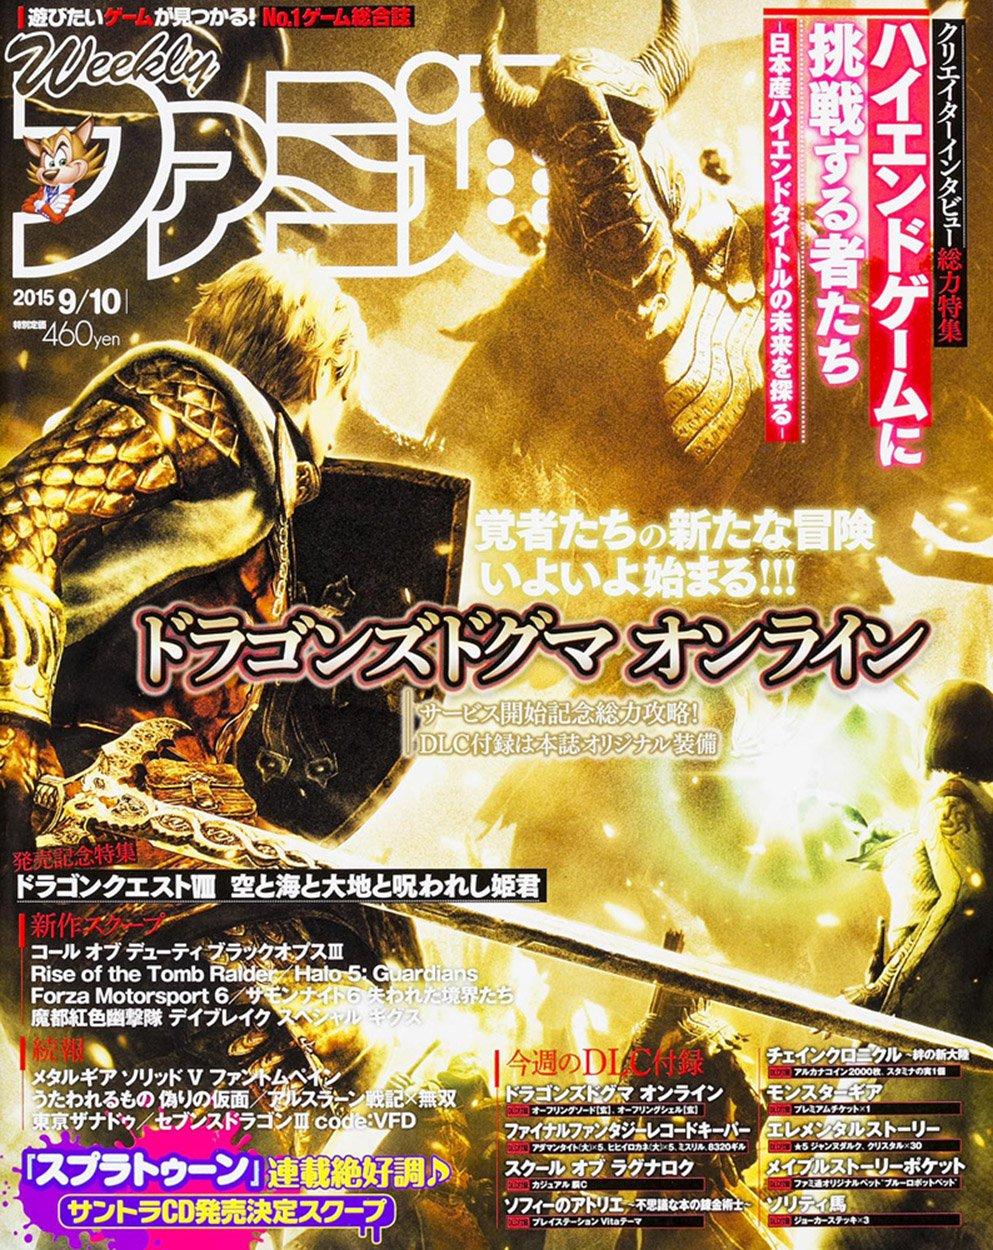 Famitsu 1395 September 10, 2015